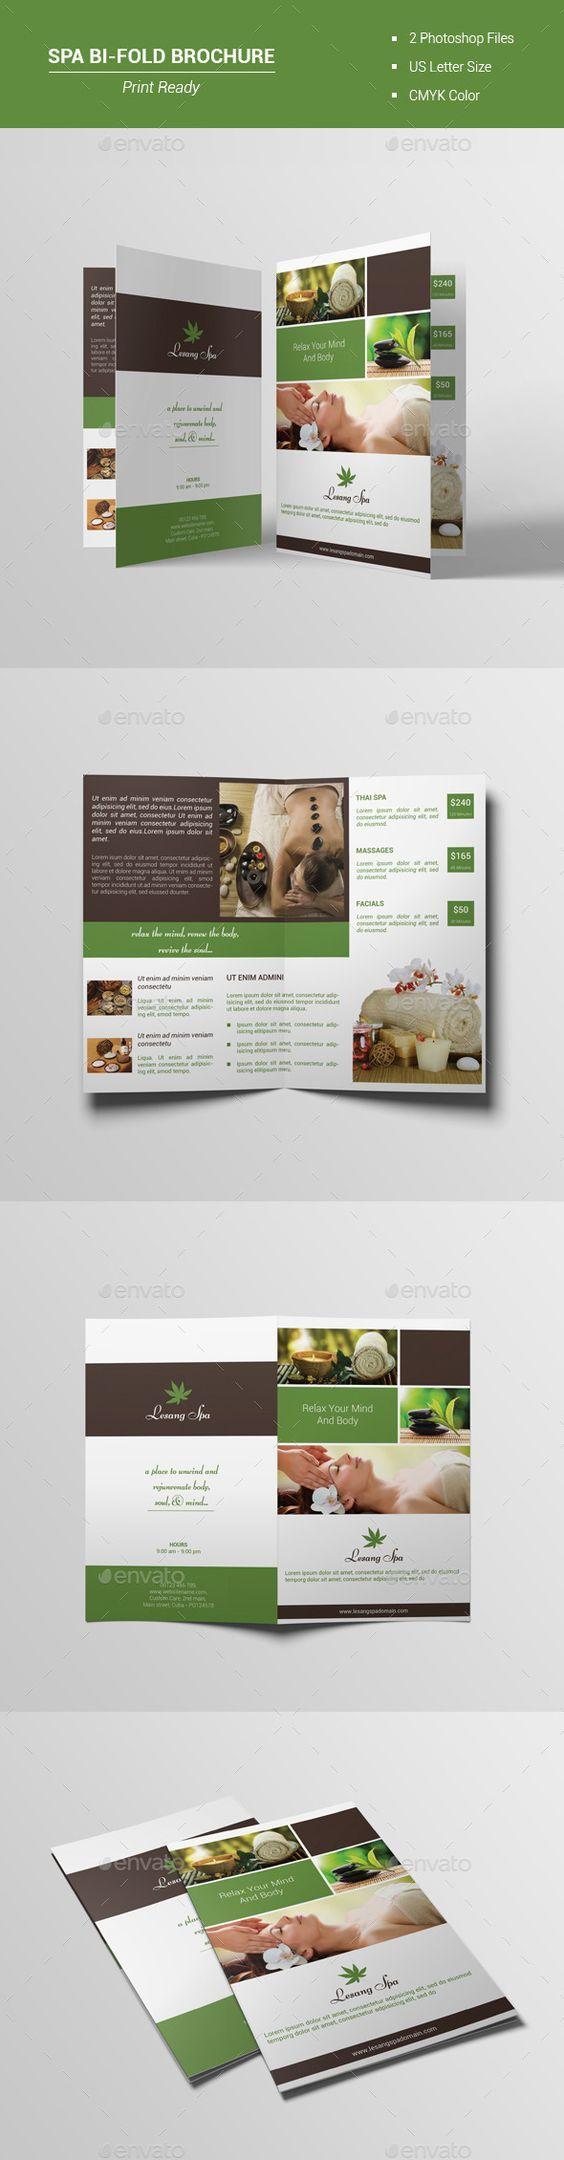 Information is key in spa brochure designs